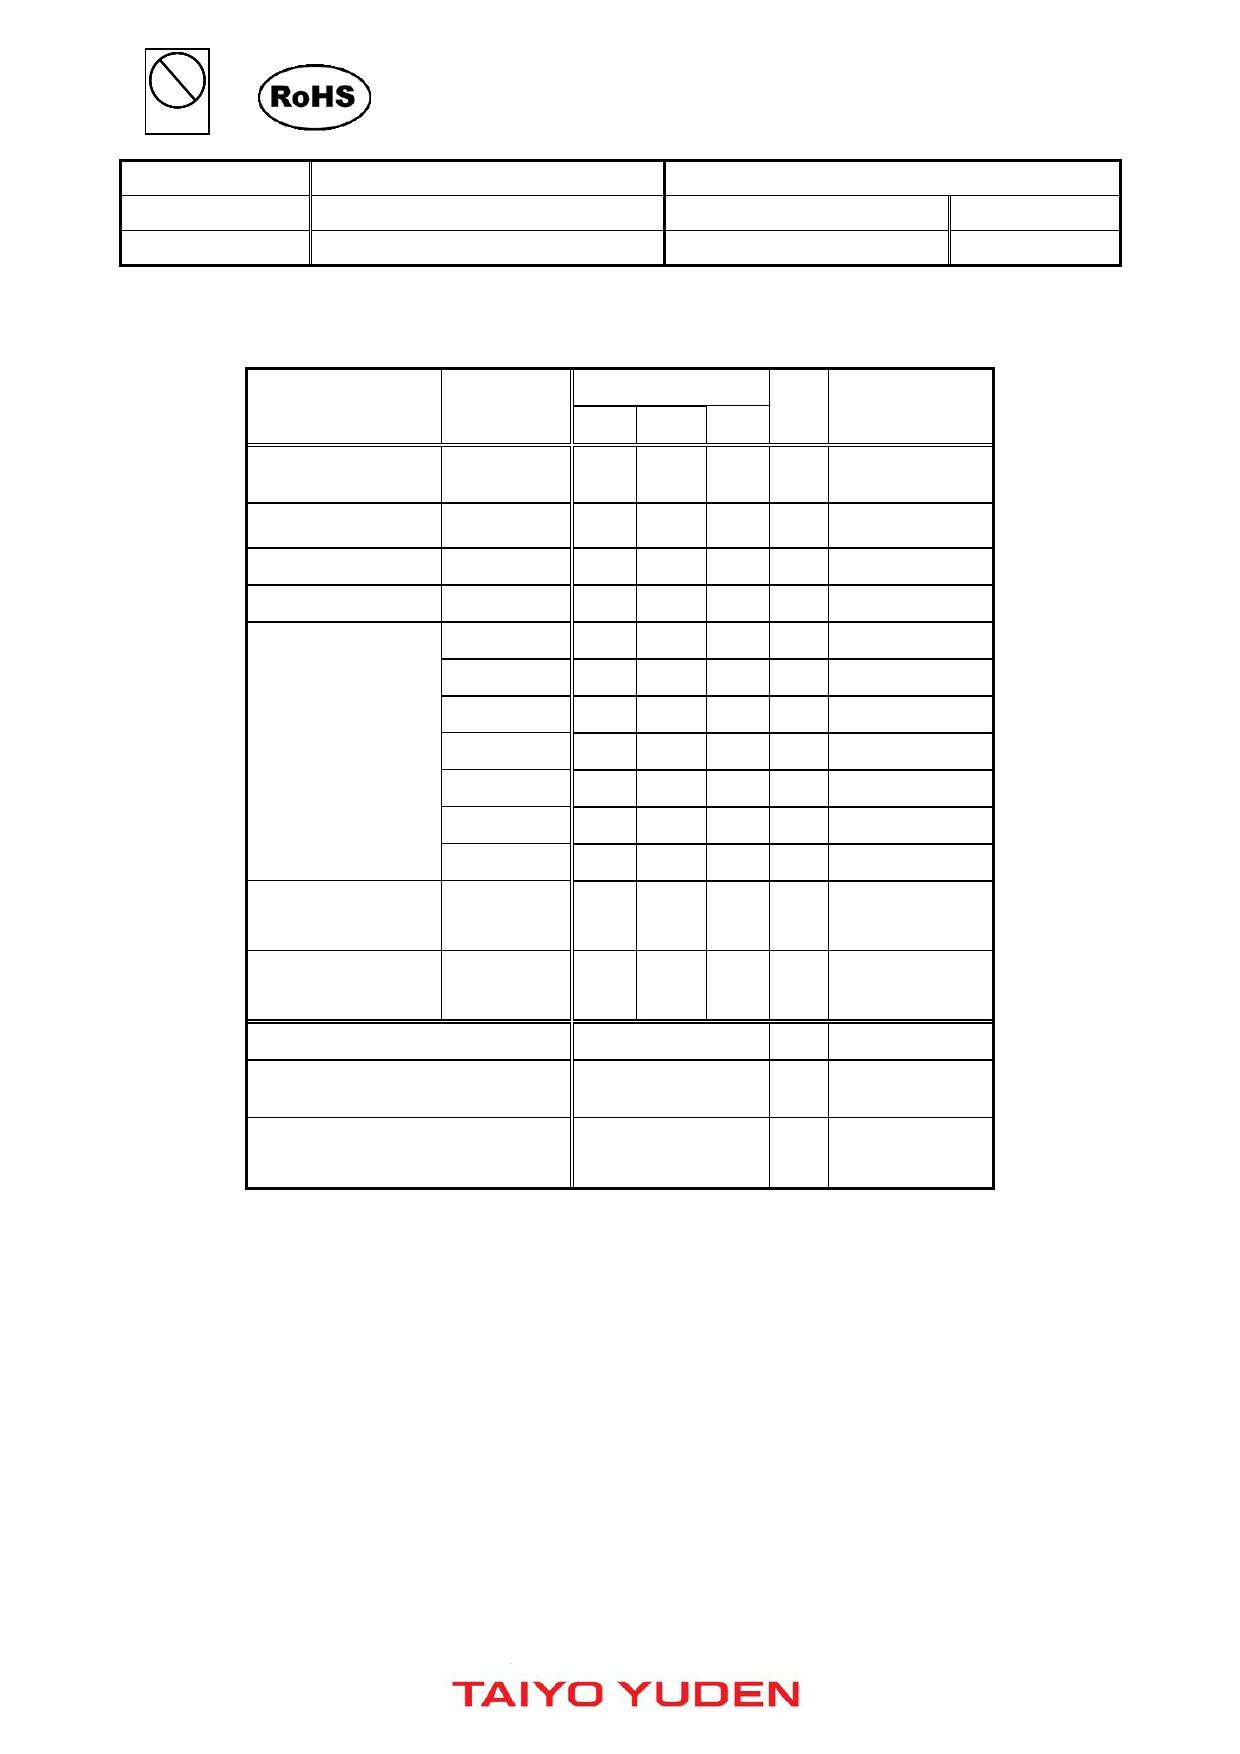 F6QG1G842P2KD 데이터시트 및 F6QG1G842P2KD PDF